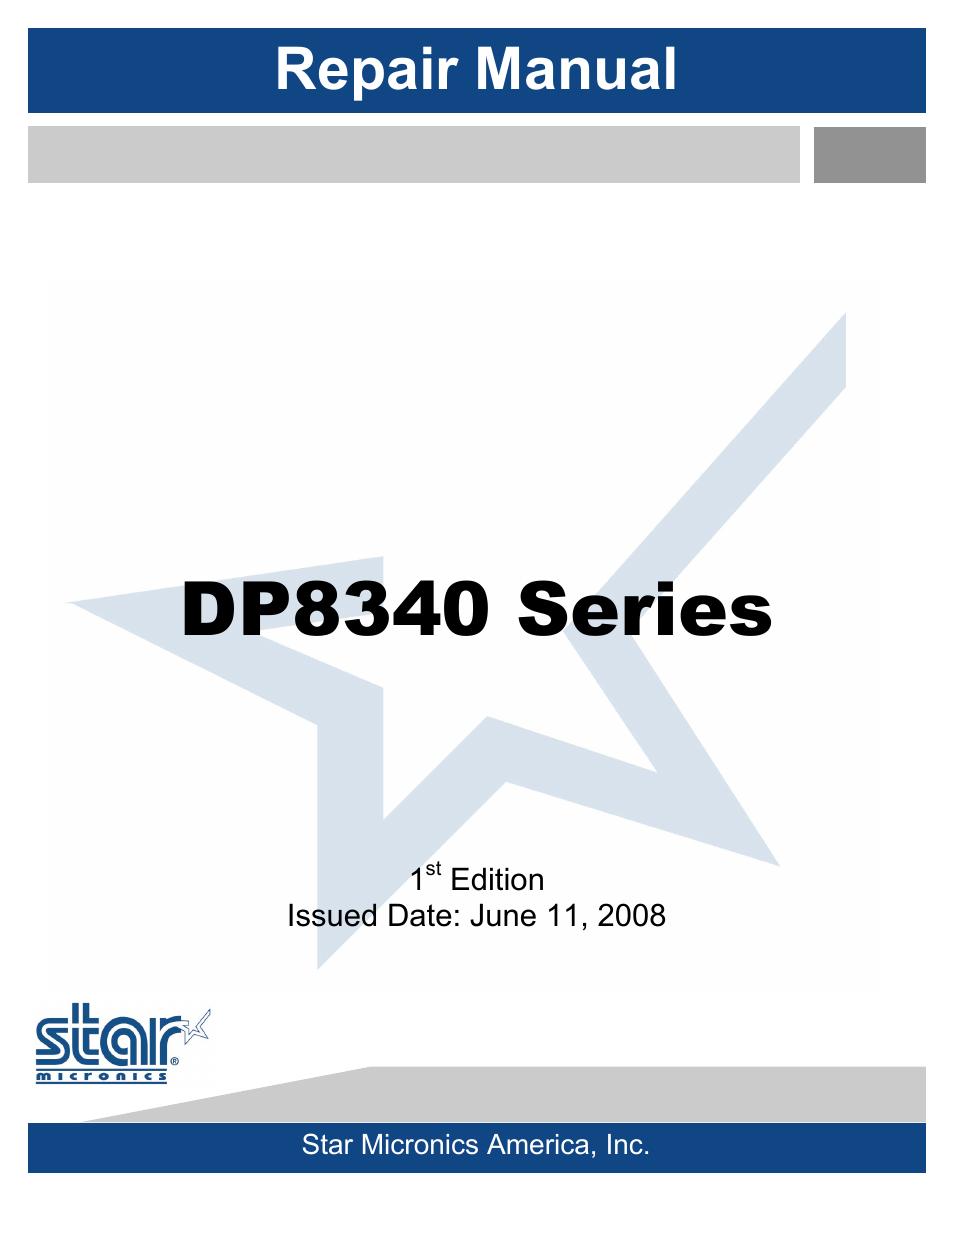 rice lake star dp8340 dot matrix service manual user manual 21 pages rh manualsdir com matrix 1000 service manual matrix 6 service manual